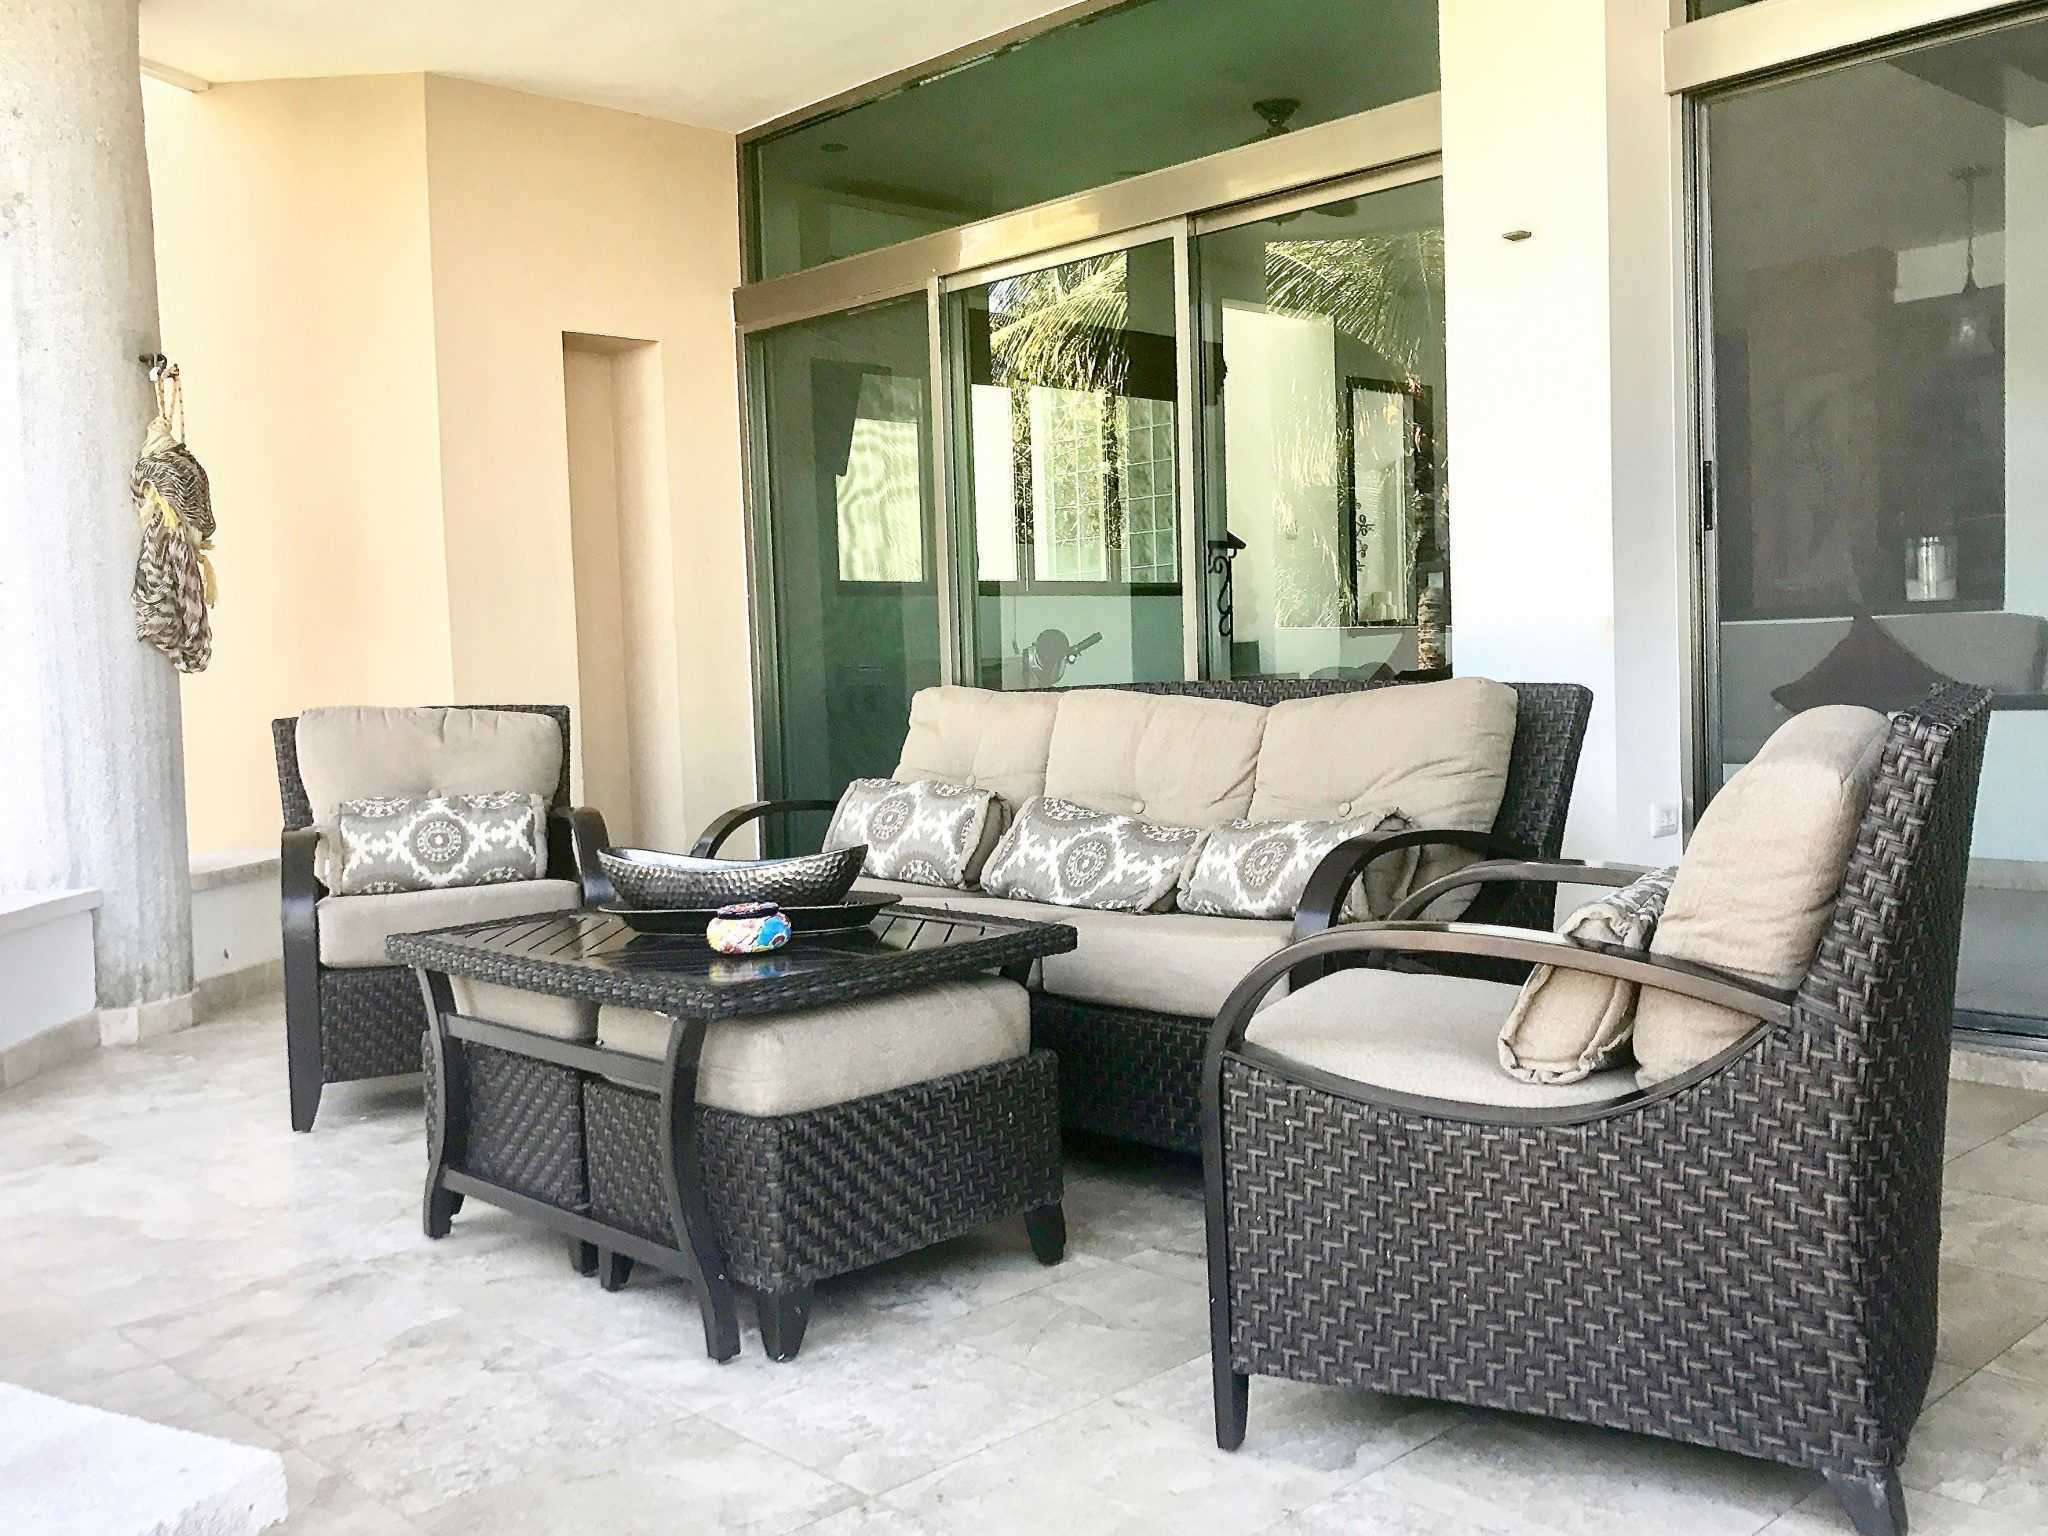 Main Villa - Dining Terrace